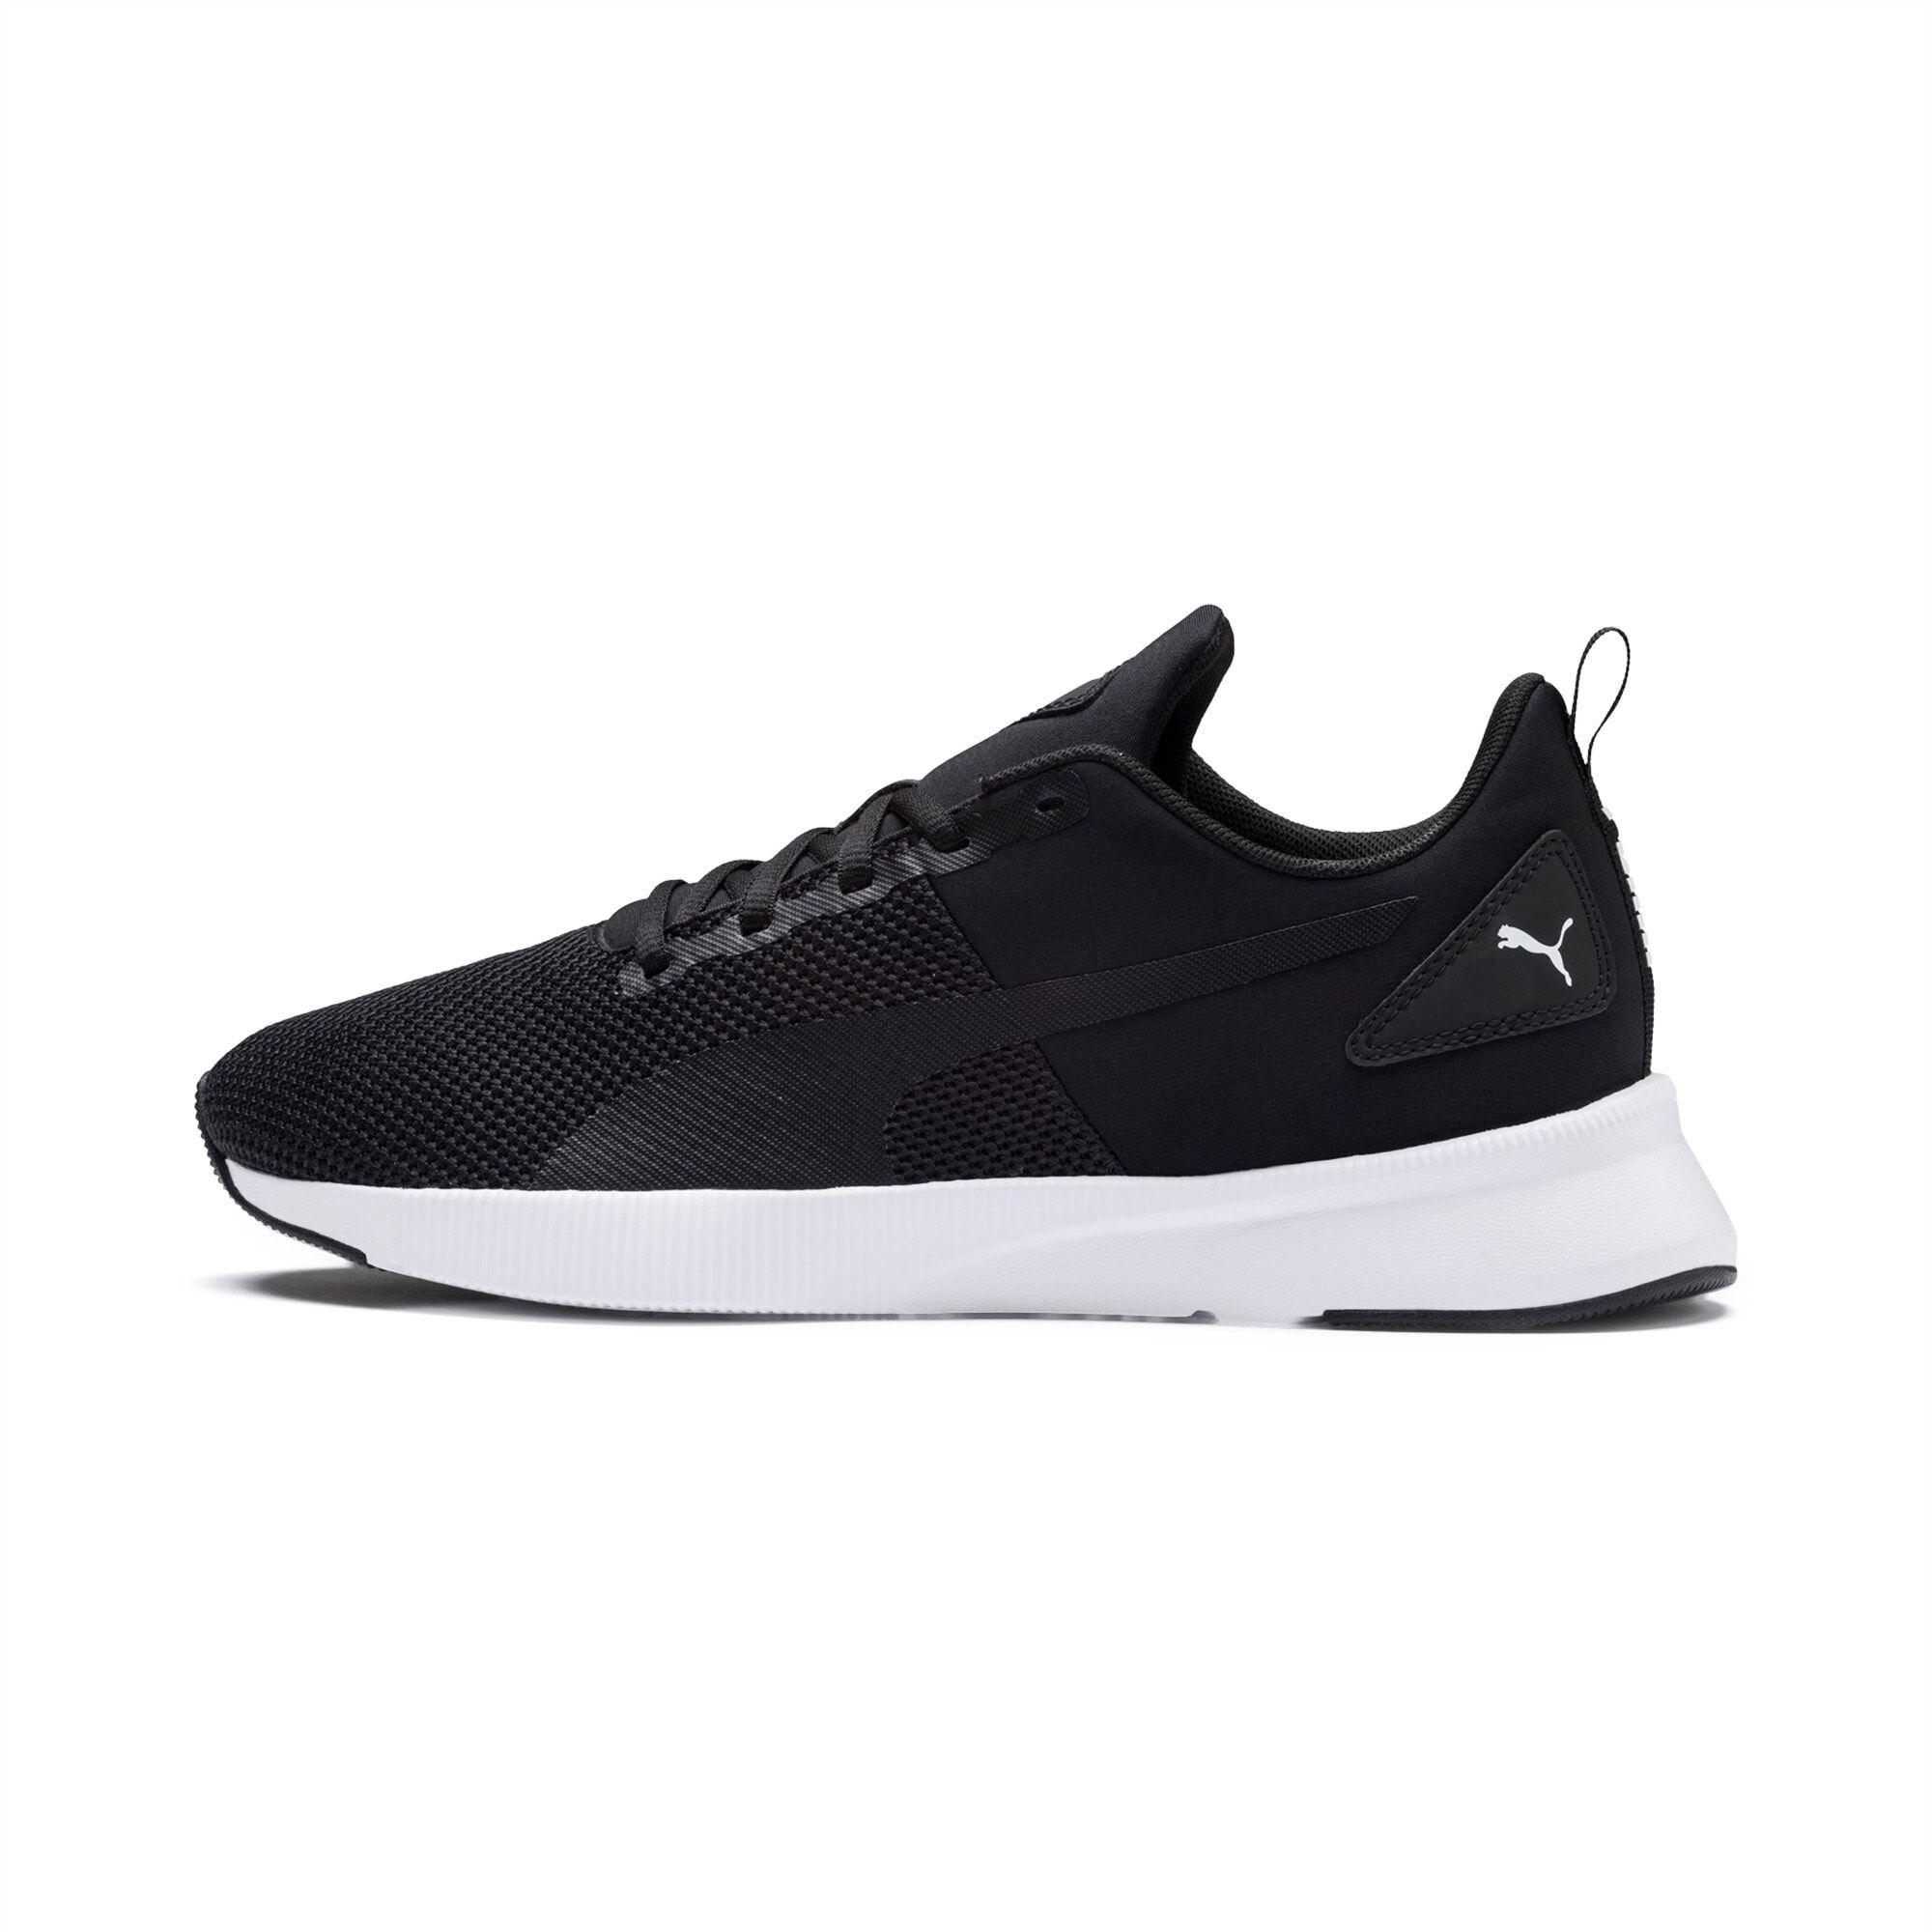 PUMA Chaussure de course Flyer Runner, Noir/Blanc, Taille 38.5, Chaussures